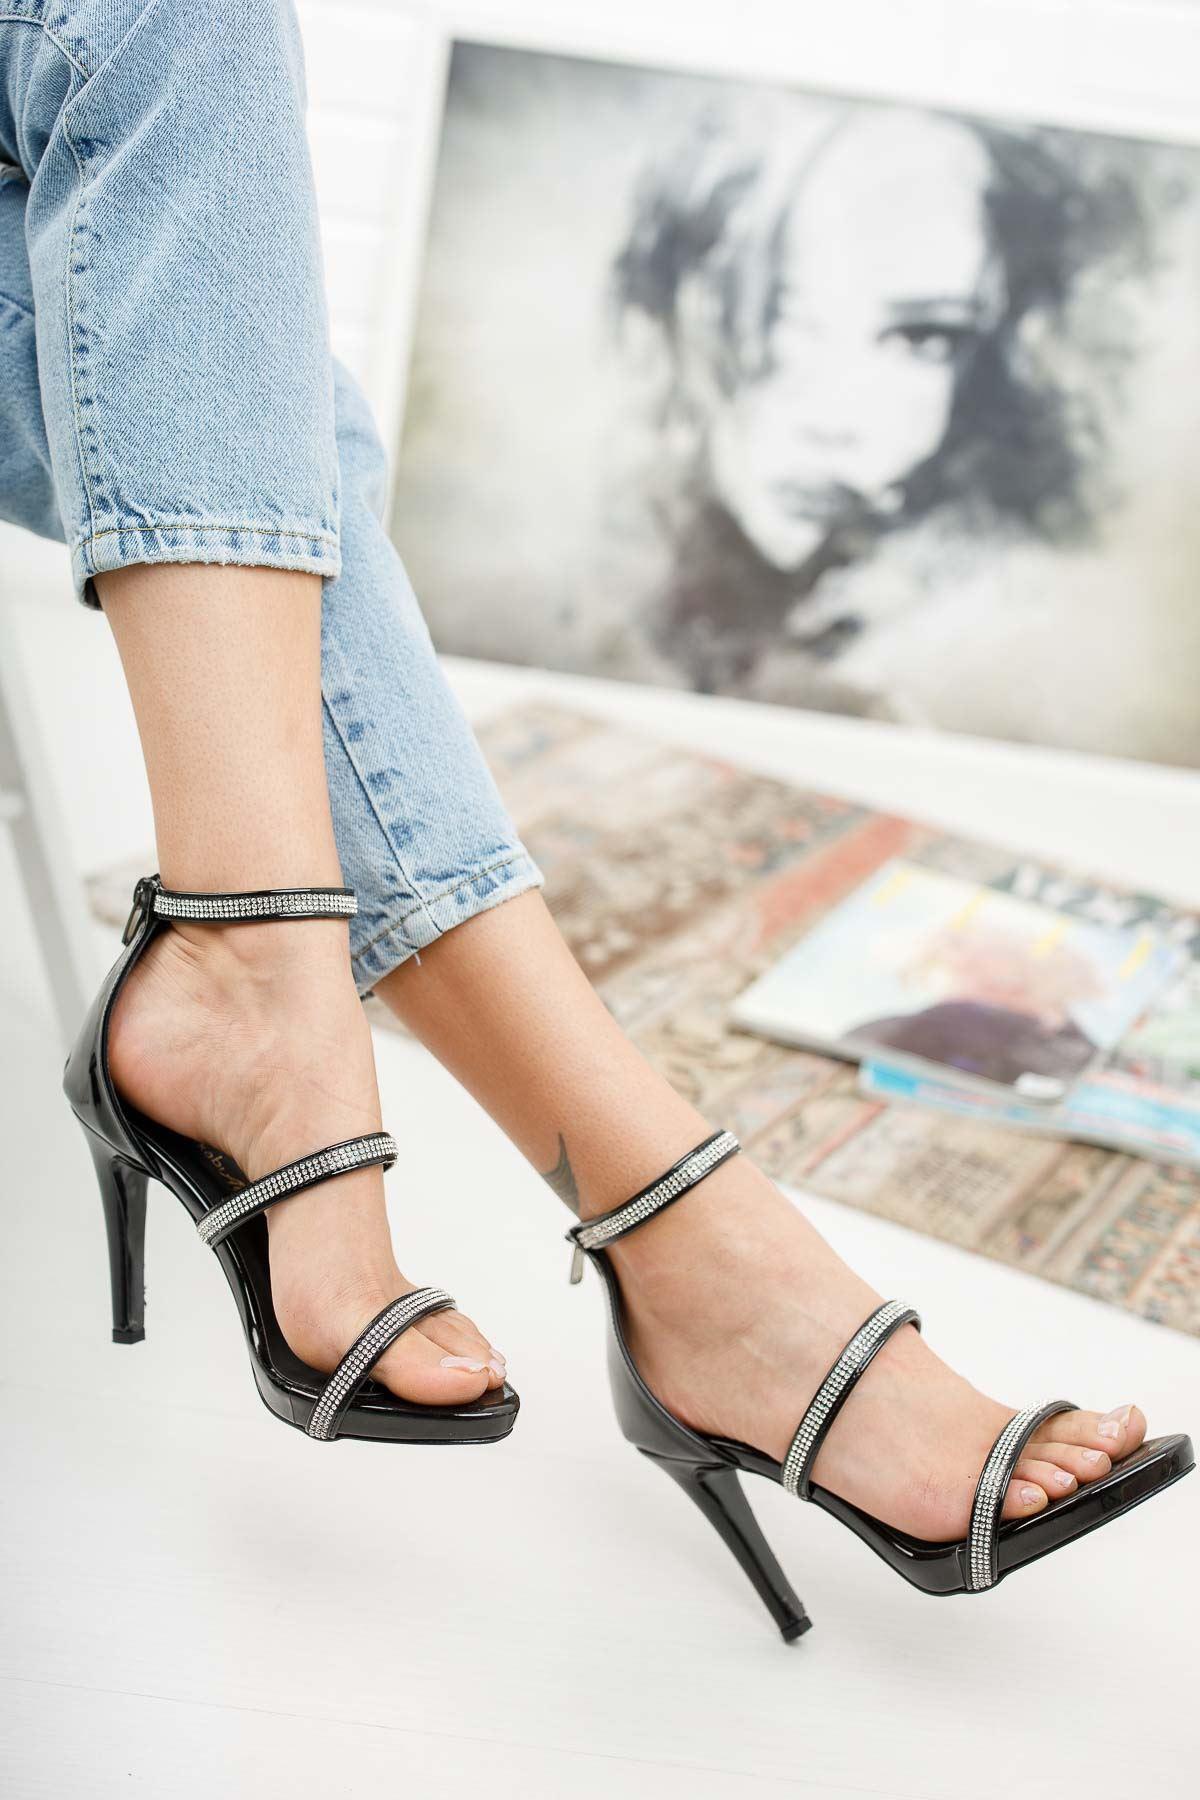 Gieda Siyah Rugan Taşı Topuklu Ayakkabı